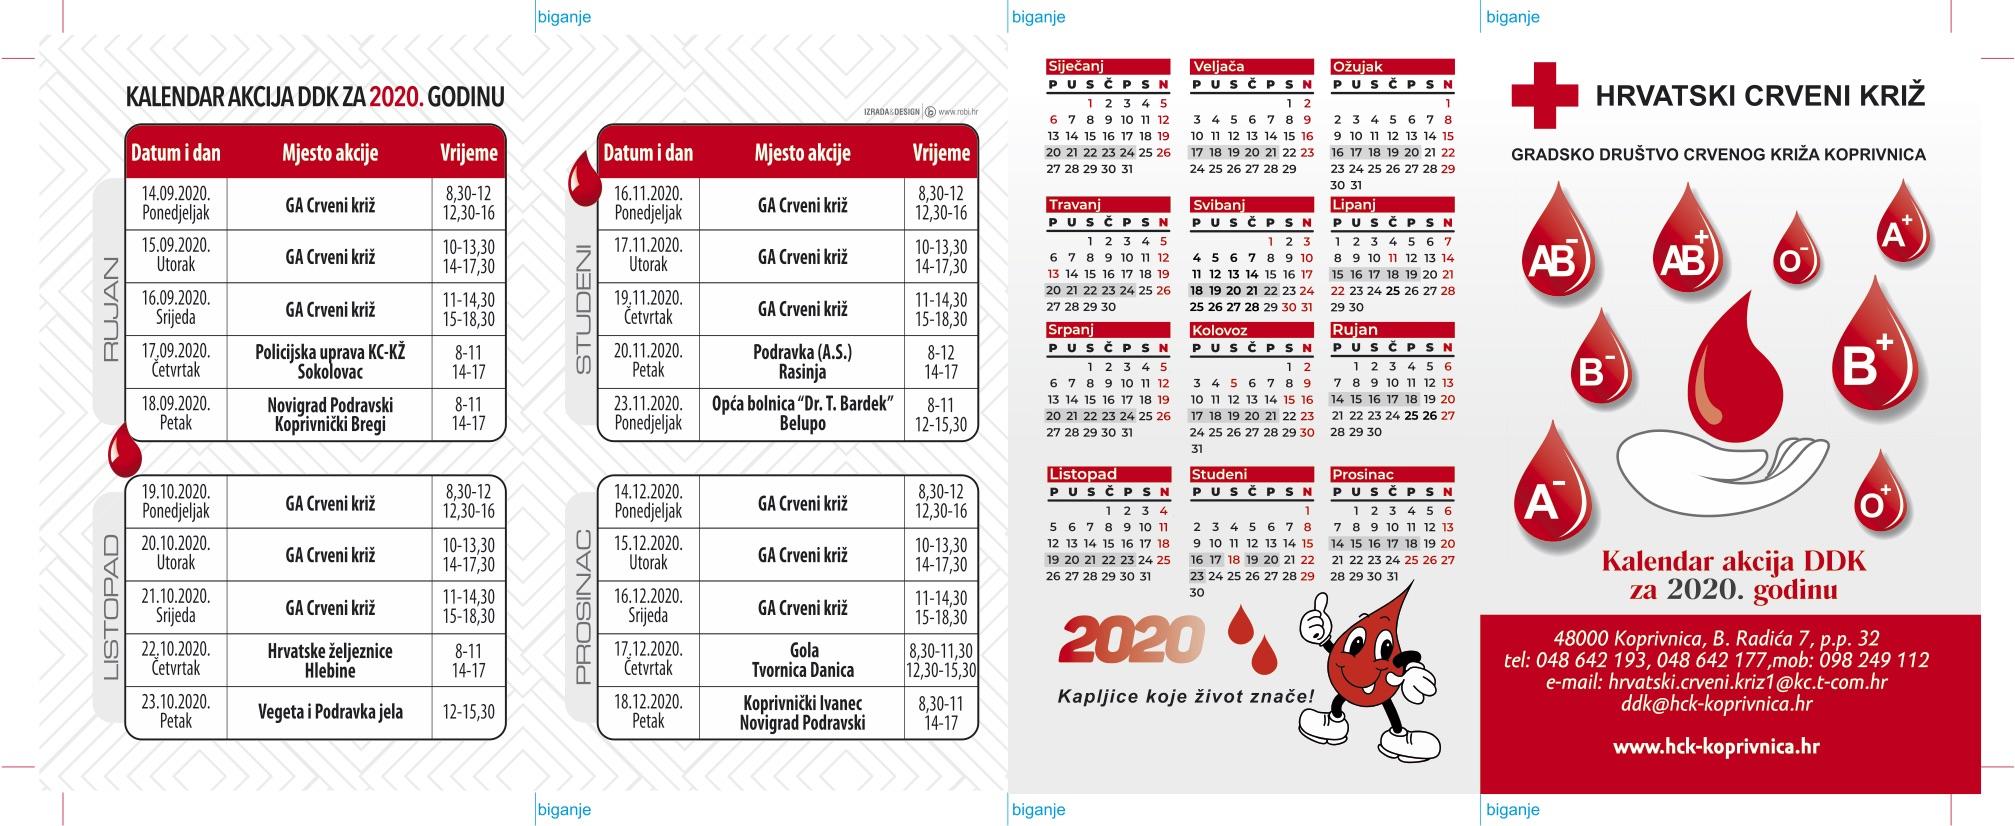 Kalendar za darivatelje krvi